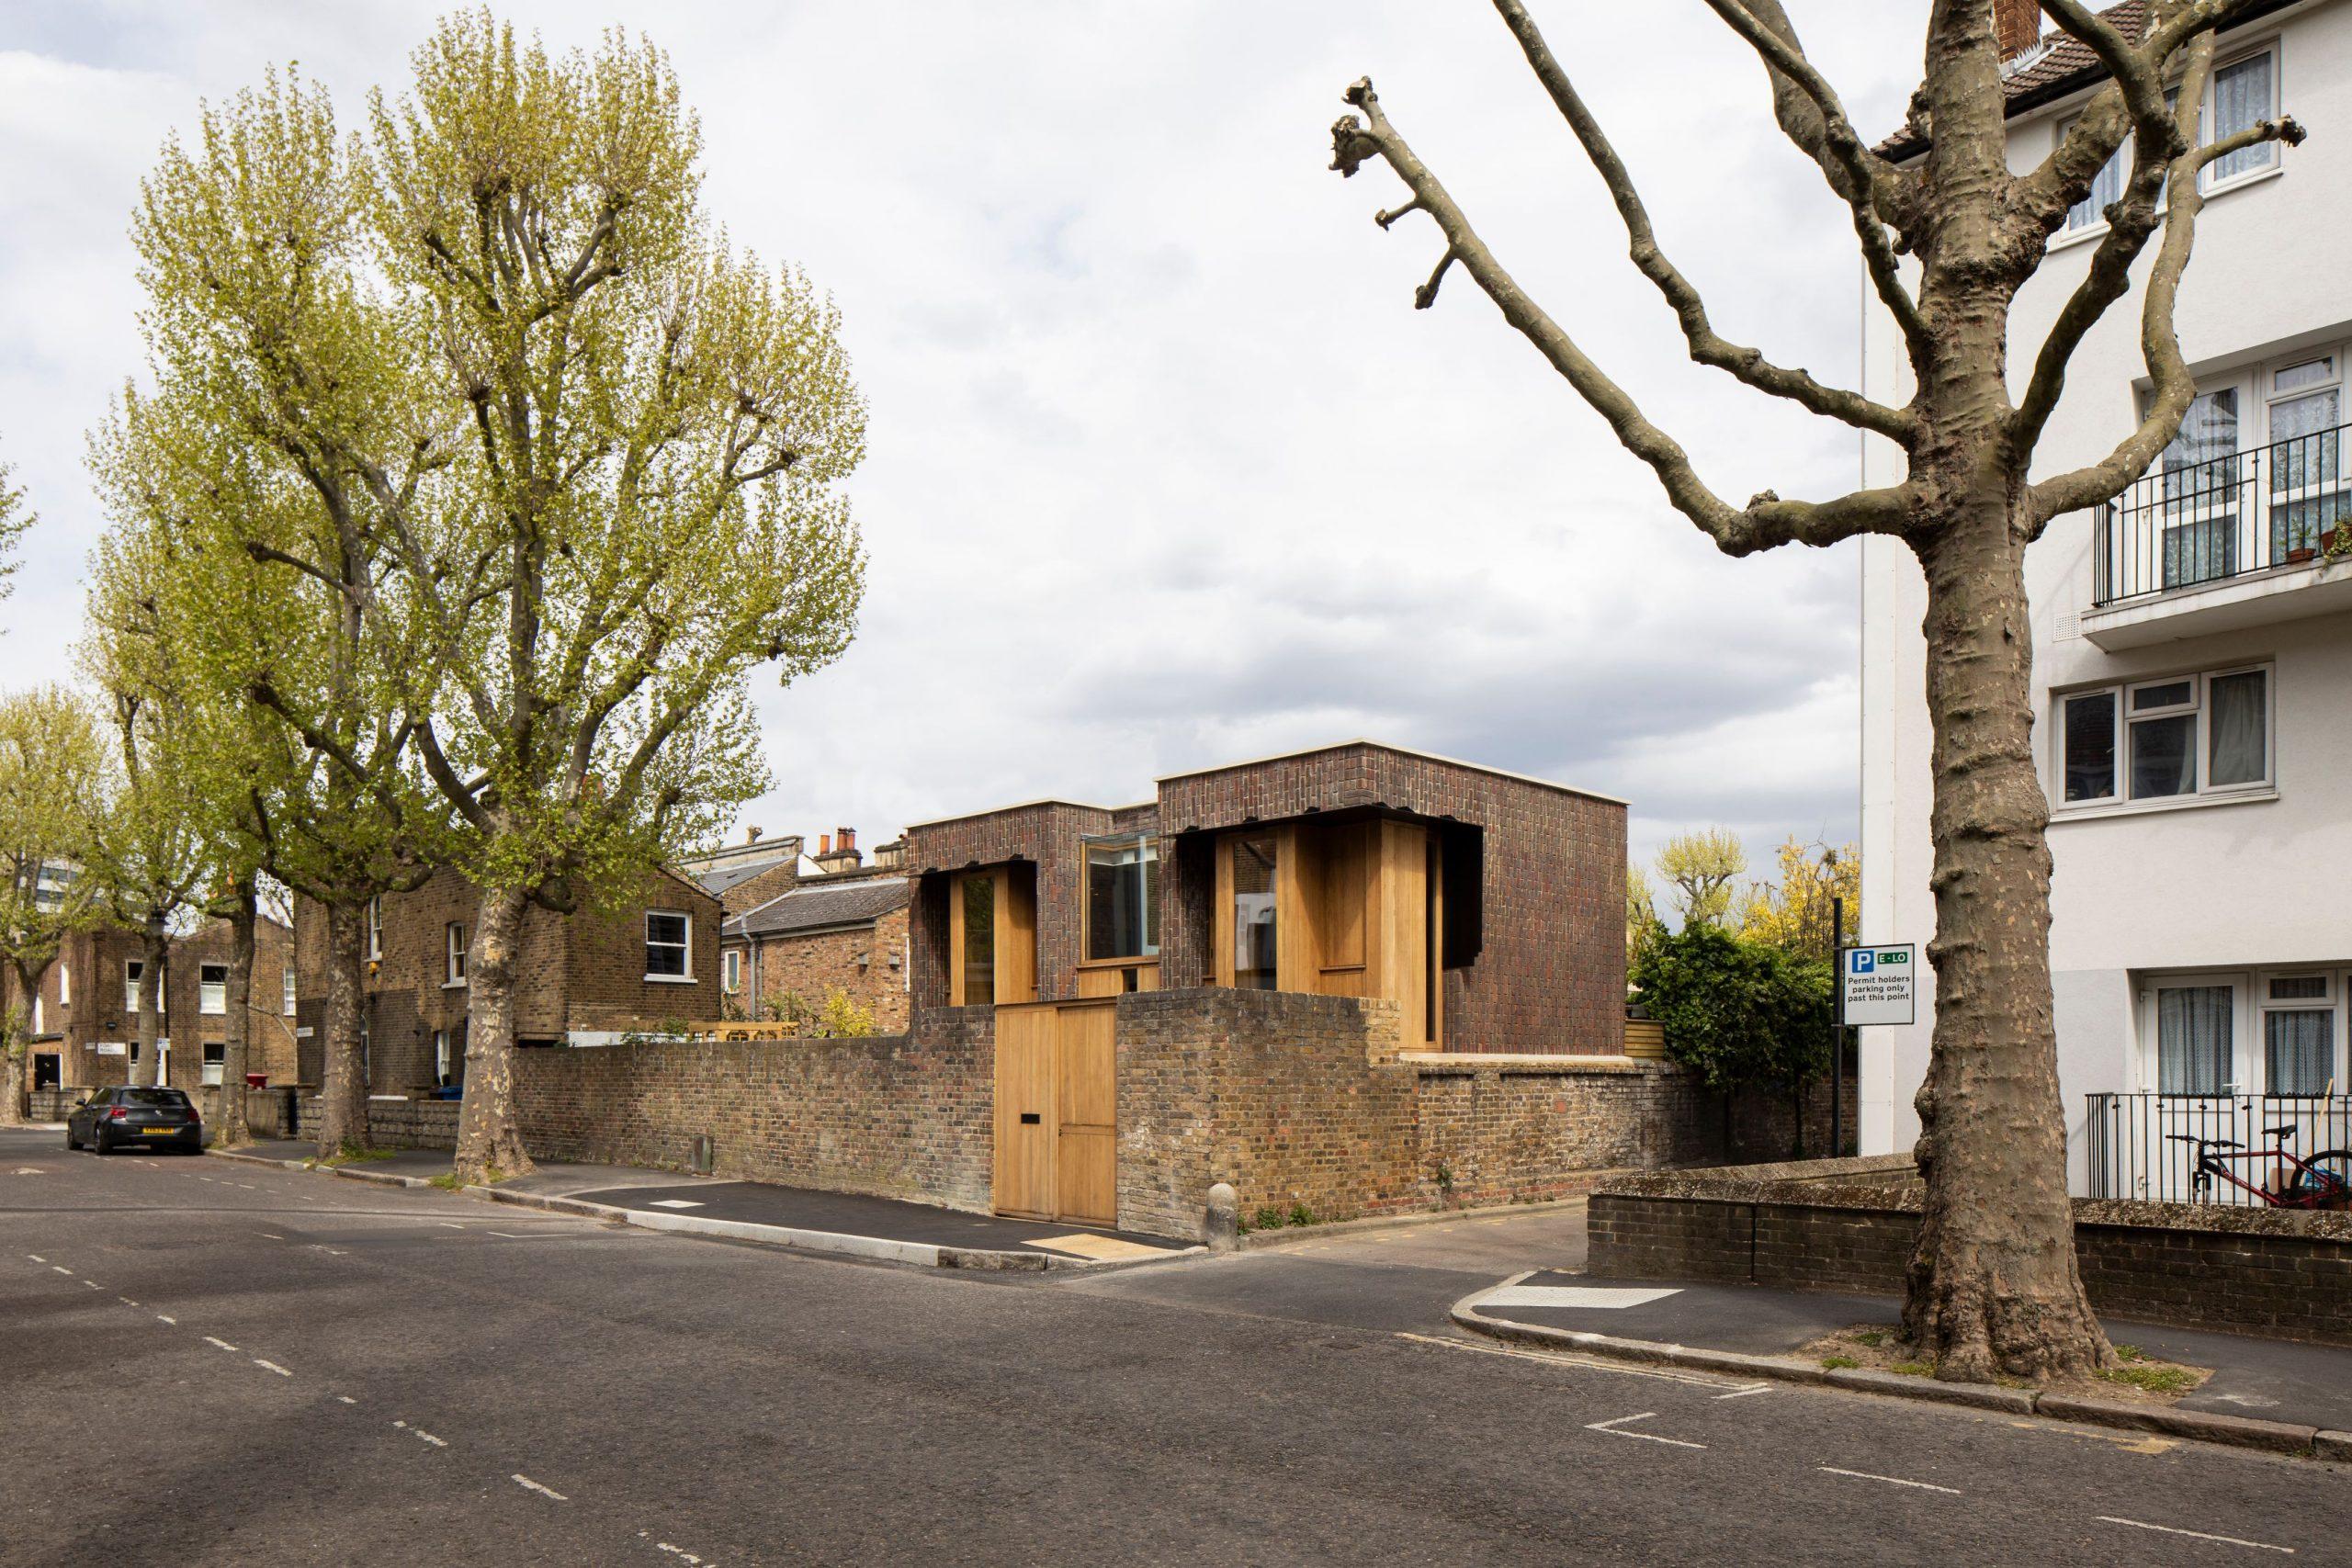 Brick_house2